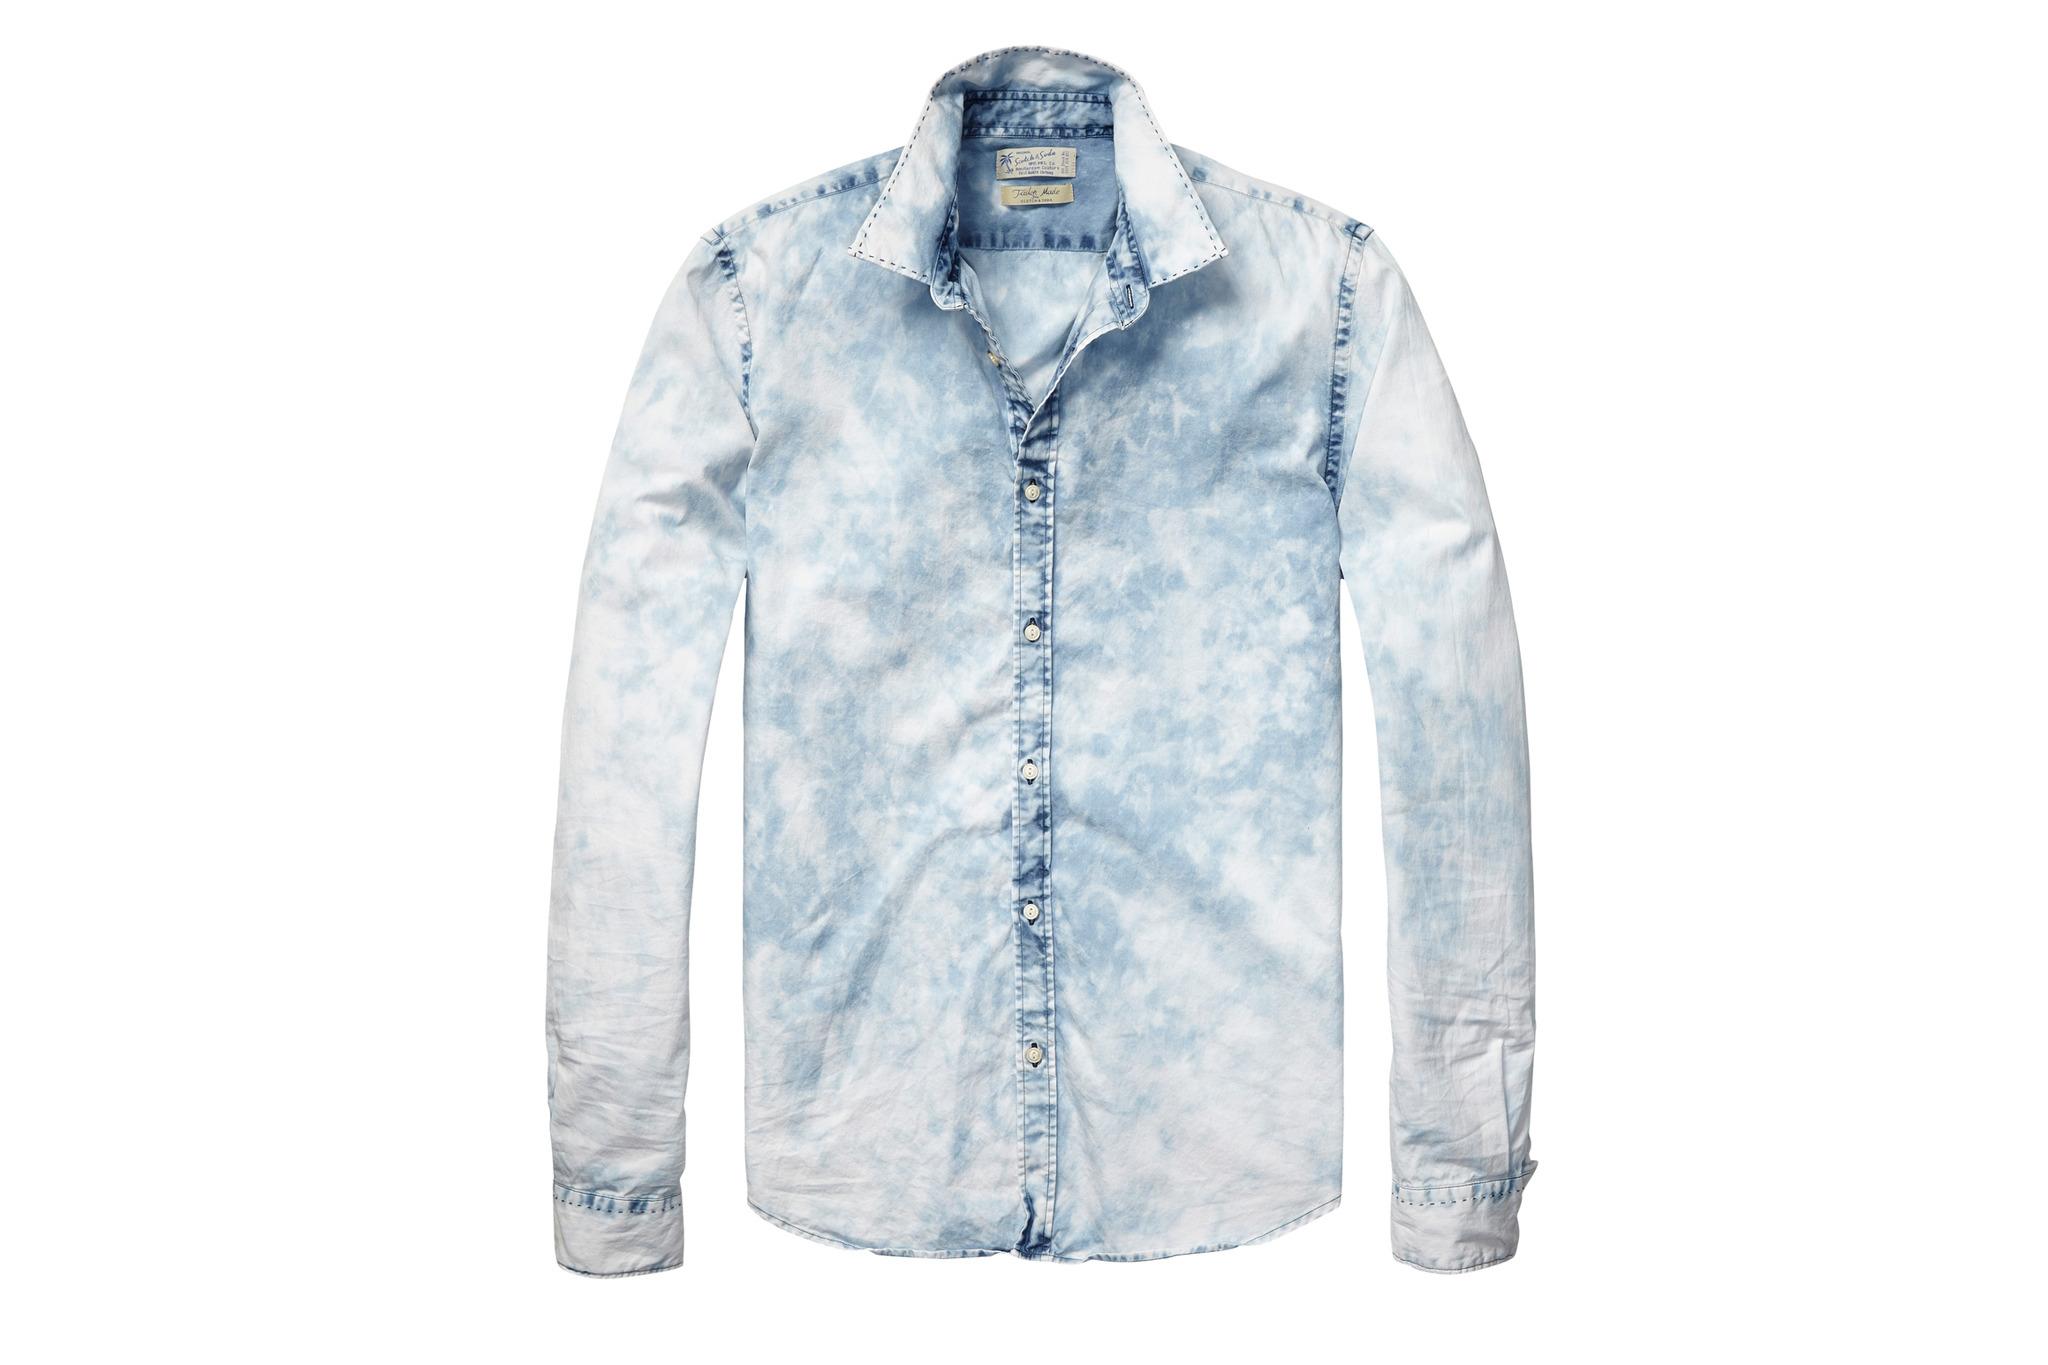 Scotch & Soda relaxed-fit denim shirt, $115, at scotch-soda.com